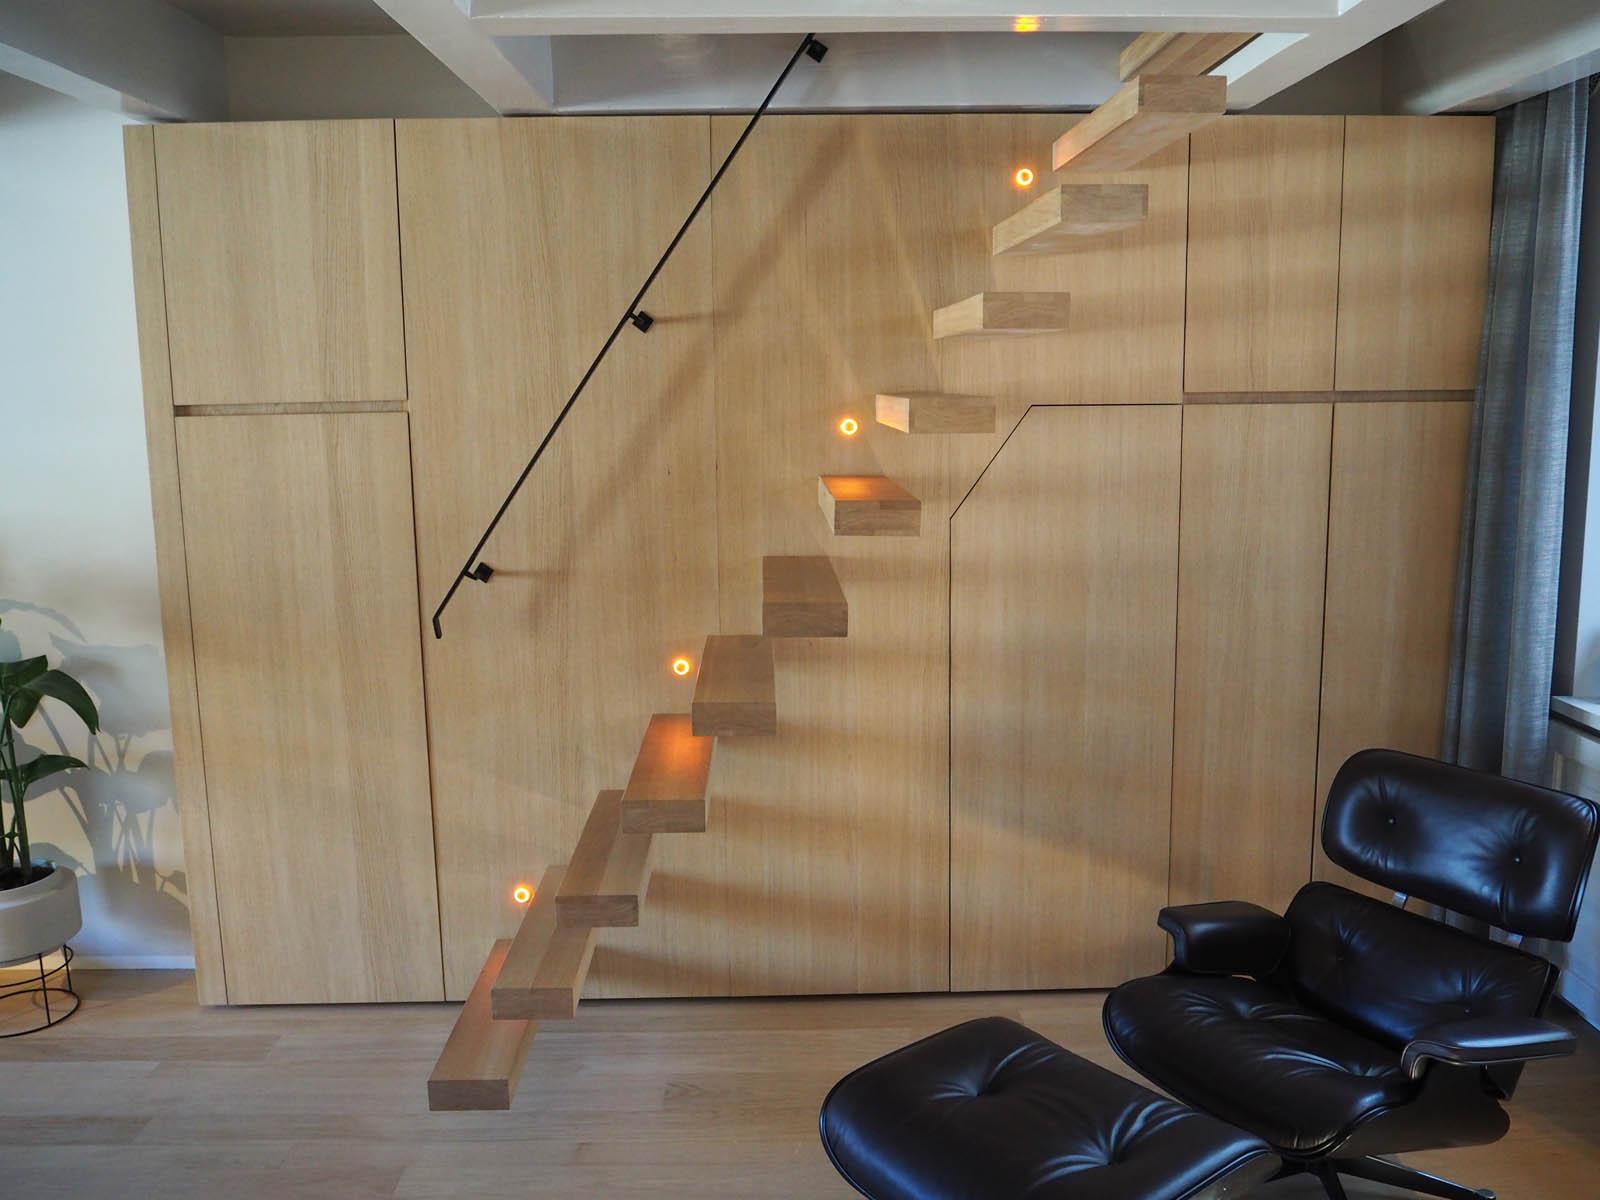 jordaan_amsterdam_grachtenpand_stair_stairs_jeroen_de_nijs_bni